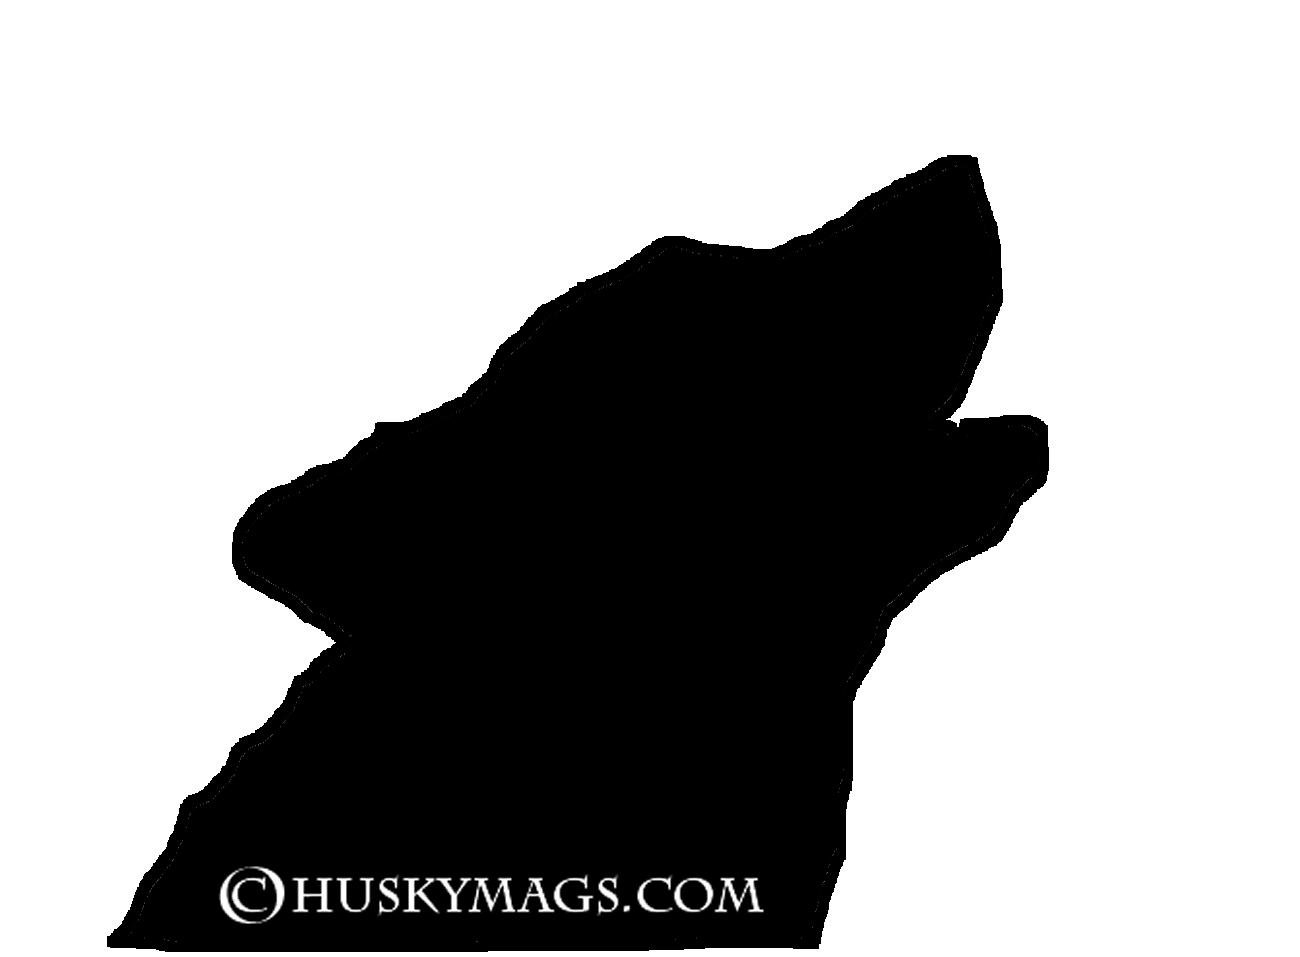 Husky Mag link